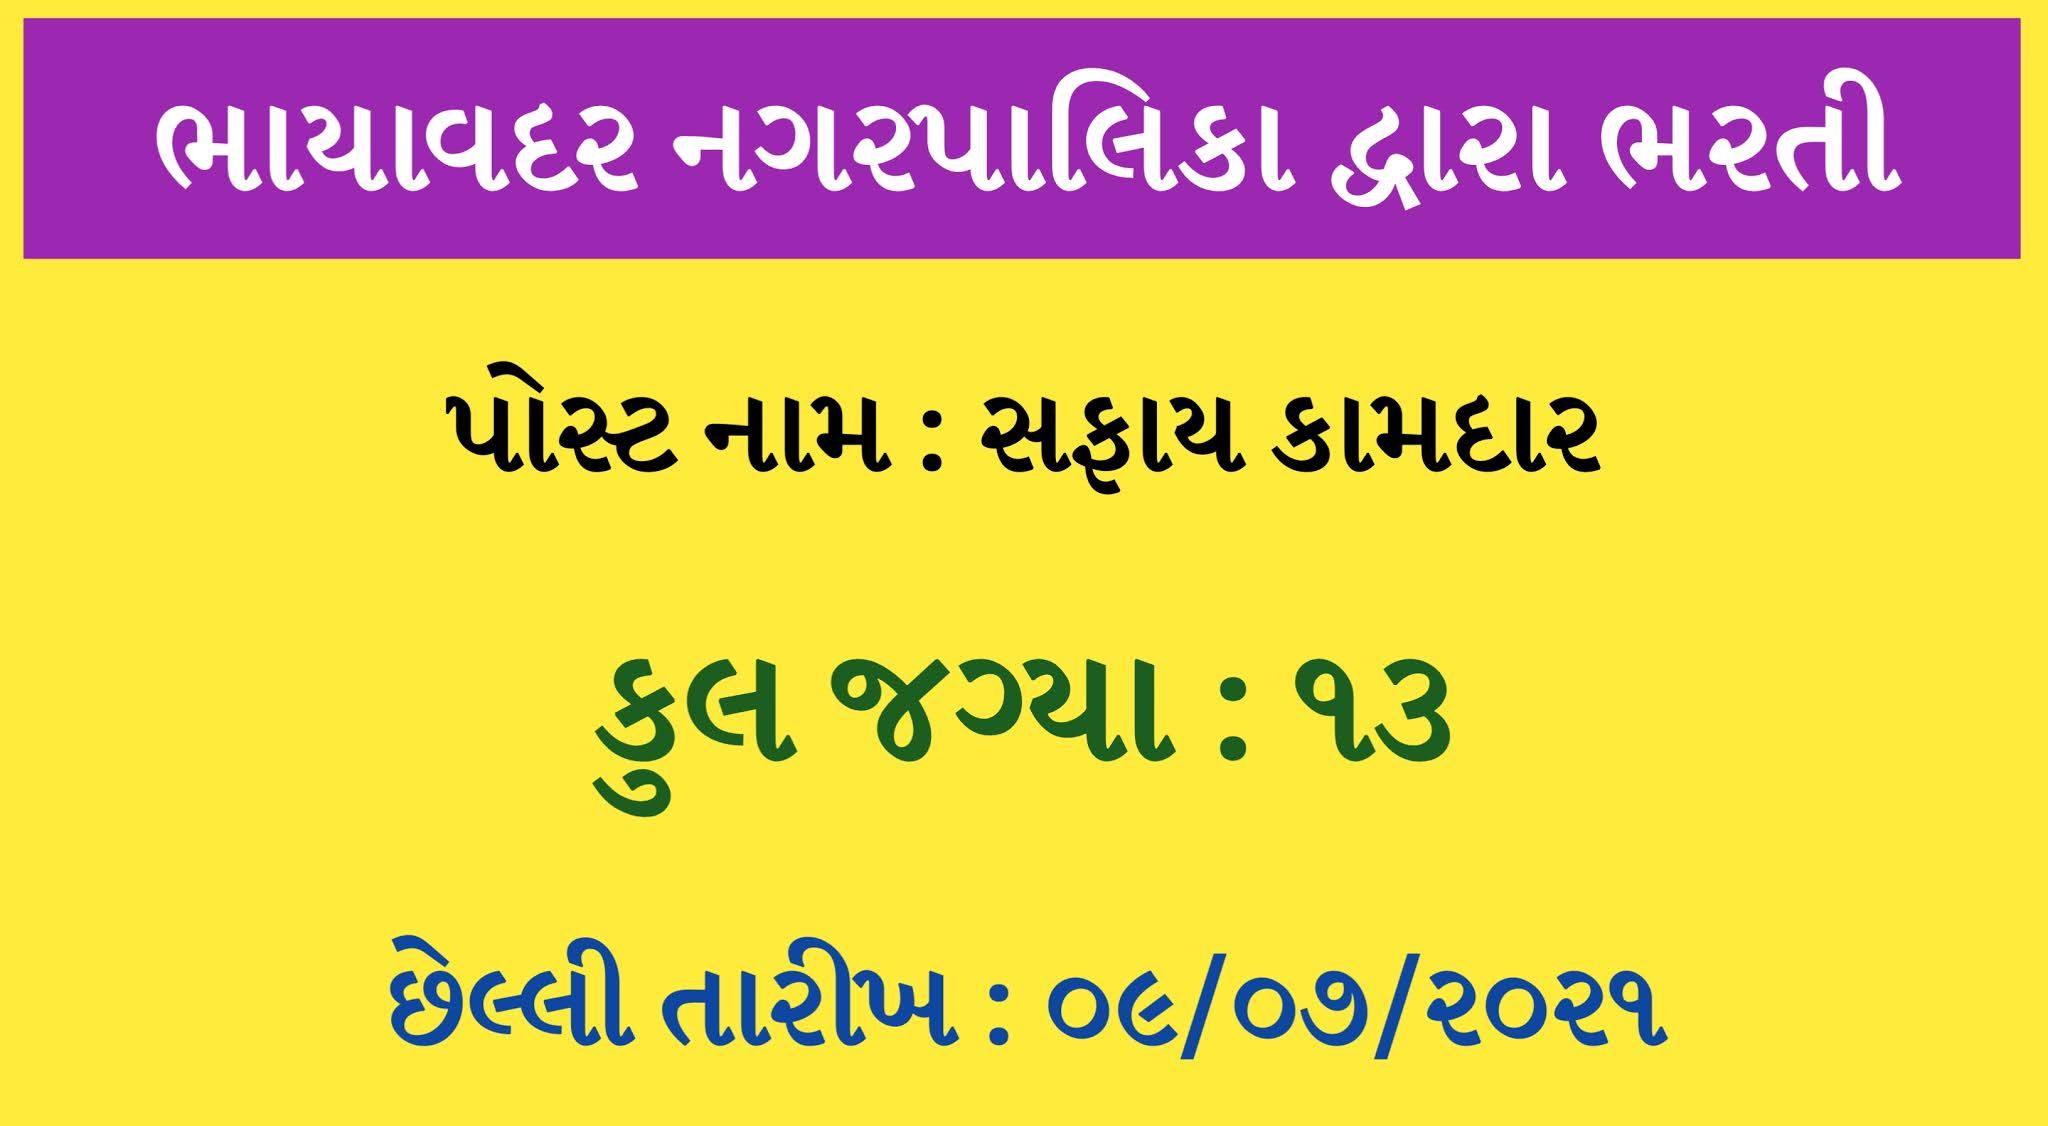 Gujarat Nagarpalika Recruitment 2021 | Bhayavadar Nagarpalika Safai Kamdar Post 2021 | Bhayavadar Nagarpalika Safai Kamdar Recruitment 2021 | Nagarpalika Safai Kamdar Recruitment 2021 | Nagarpalika Recruitment 2021 | Safai Kamdar Recruitment 2021